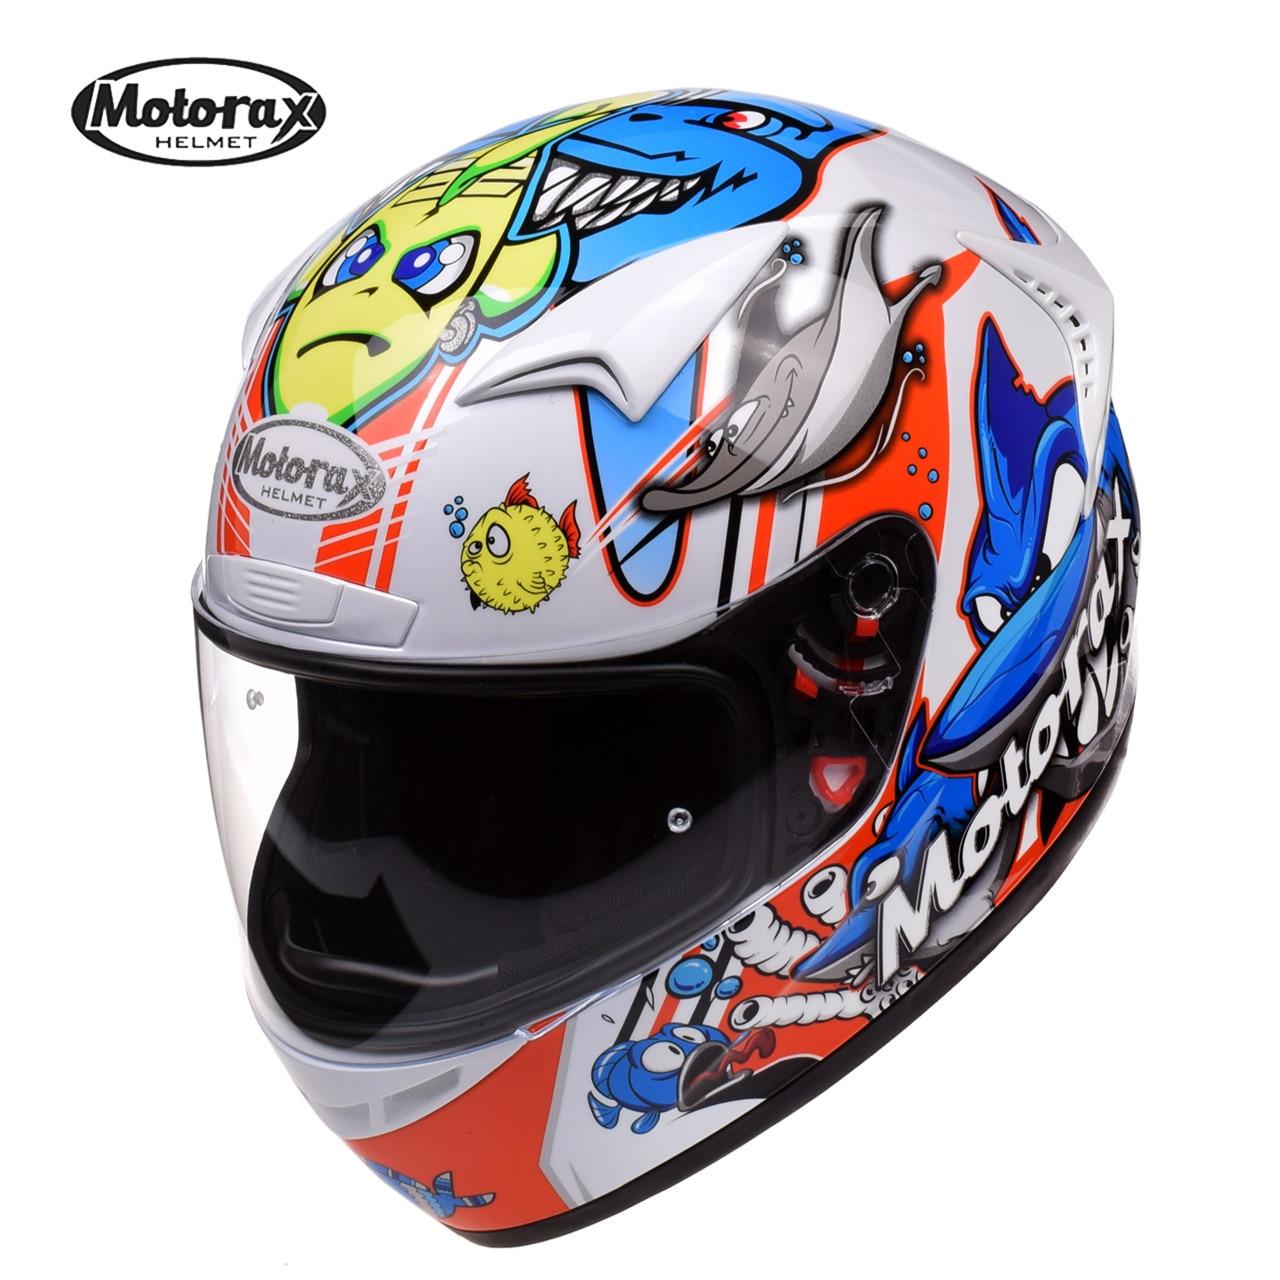 цена на MOTORAX R30 Motorcycle Helmet Racing Full Face Casco Capacete Casque Moto Helm Kask Helmets Kaski Motocyklowe Crash For Kawasaki